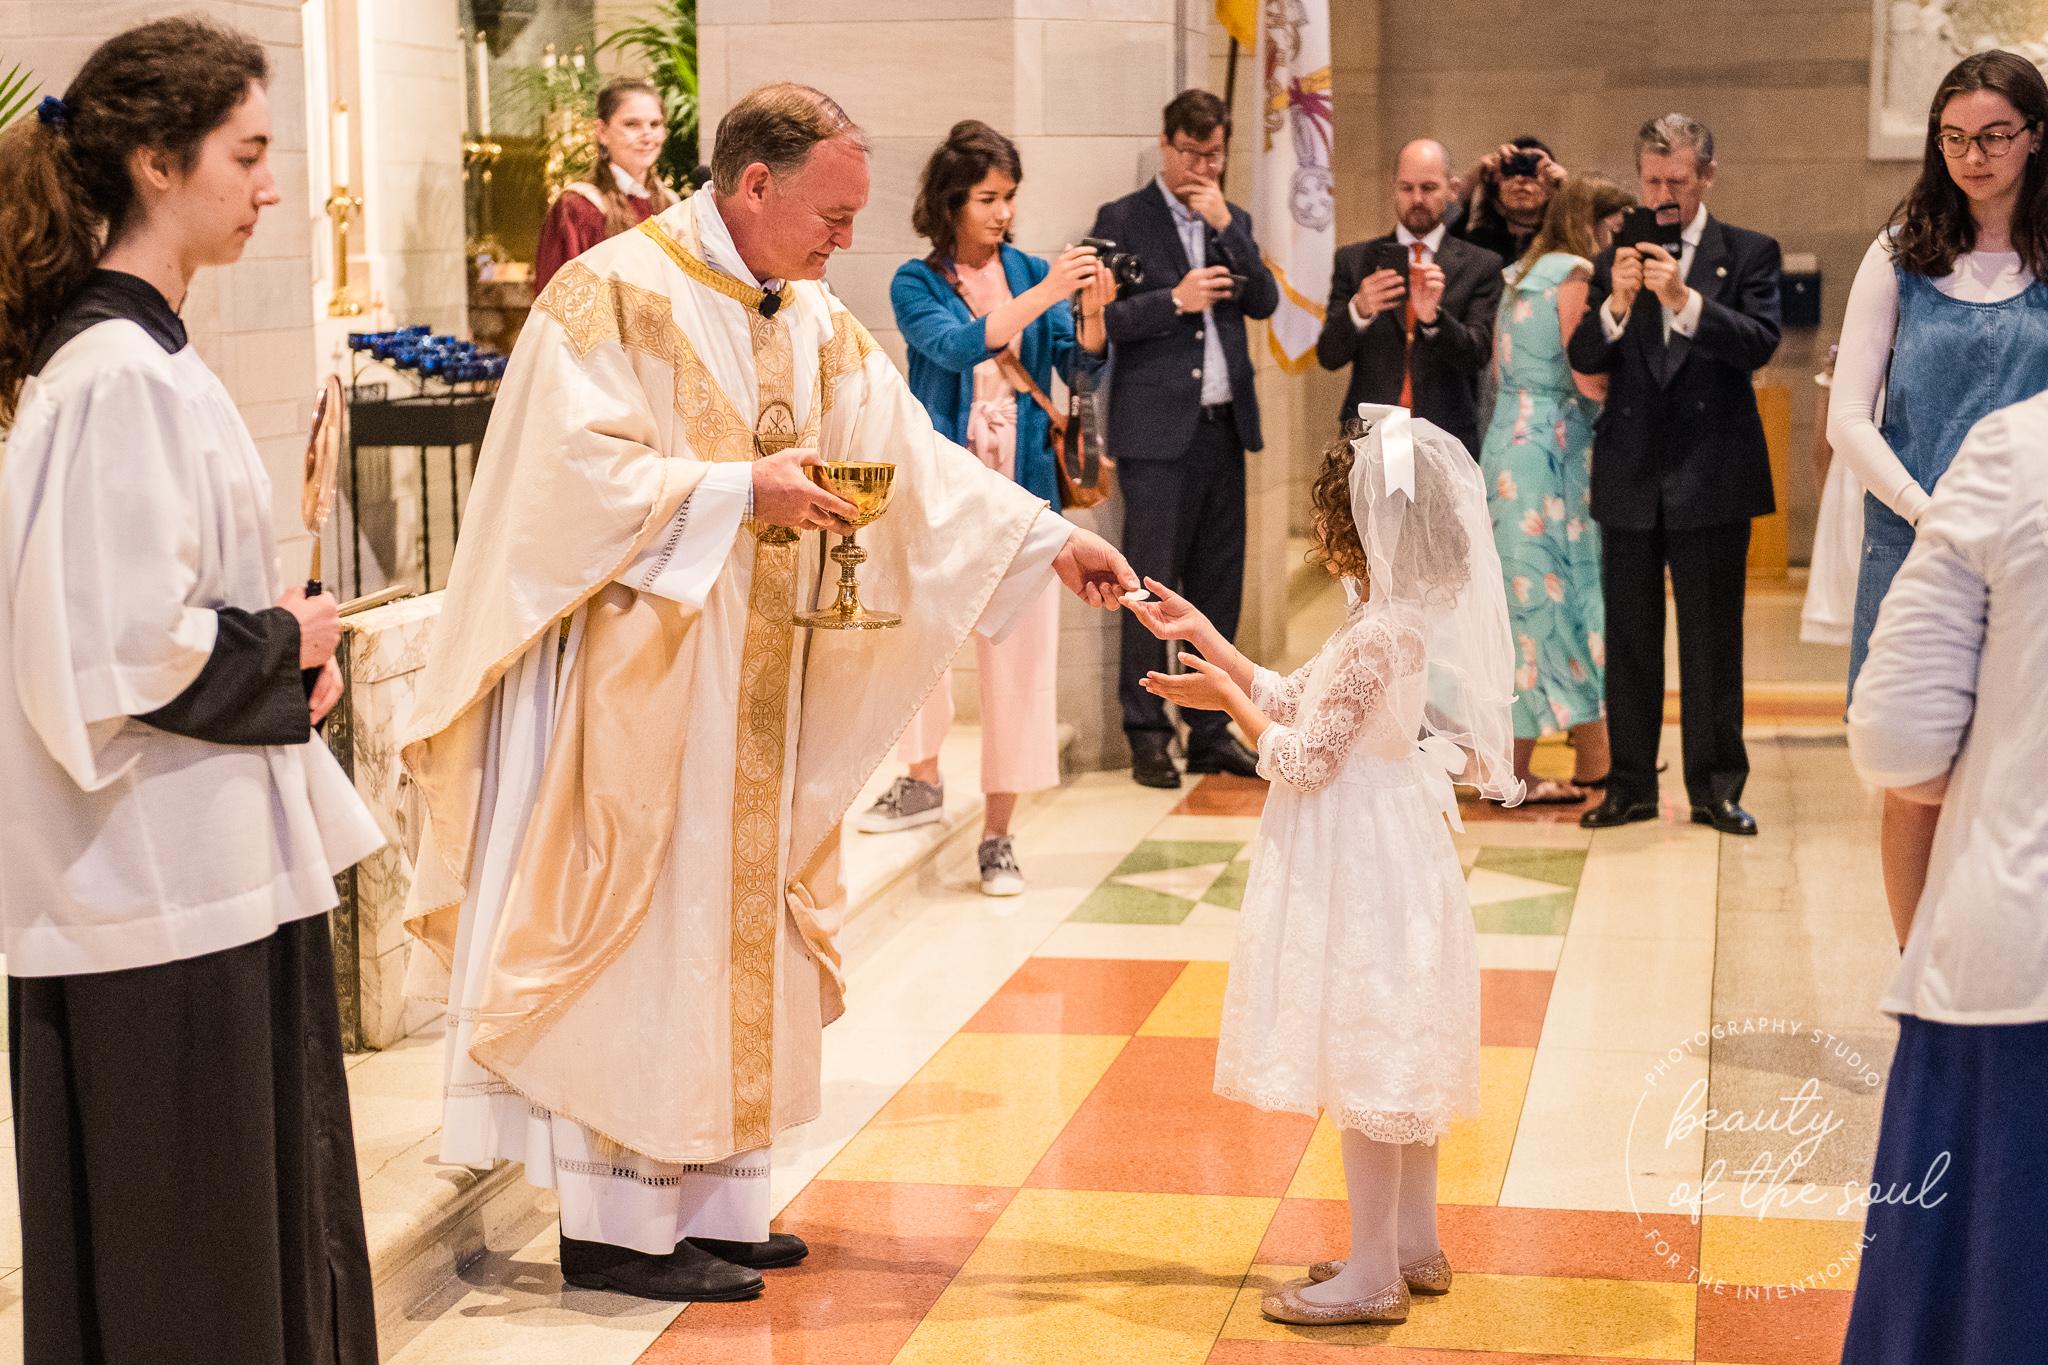 washington-dc-st-ann-catholic-church-first-holy-communion-beauty-of-the-soul-studio-may-2019-16.jpg